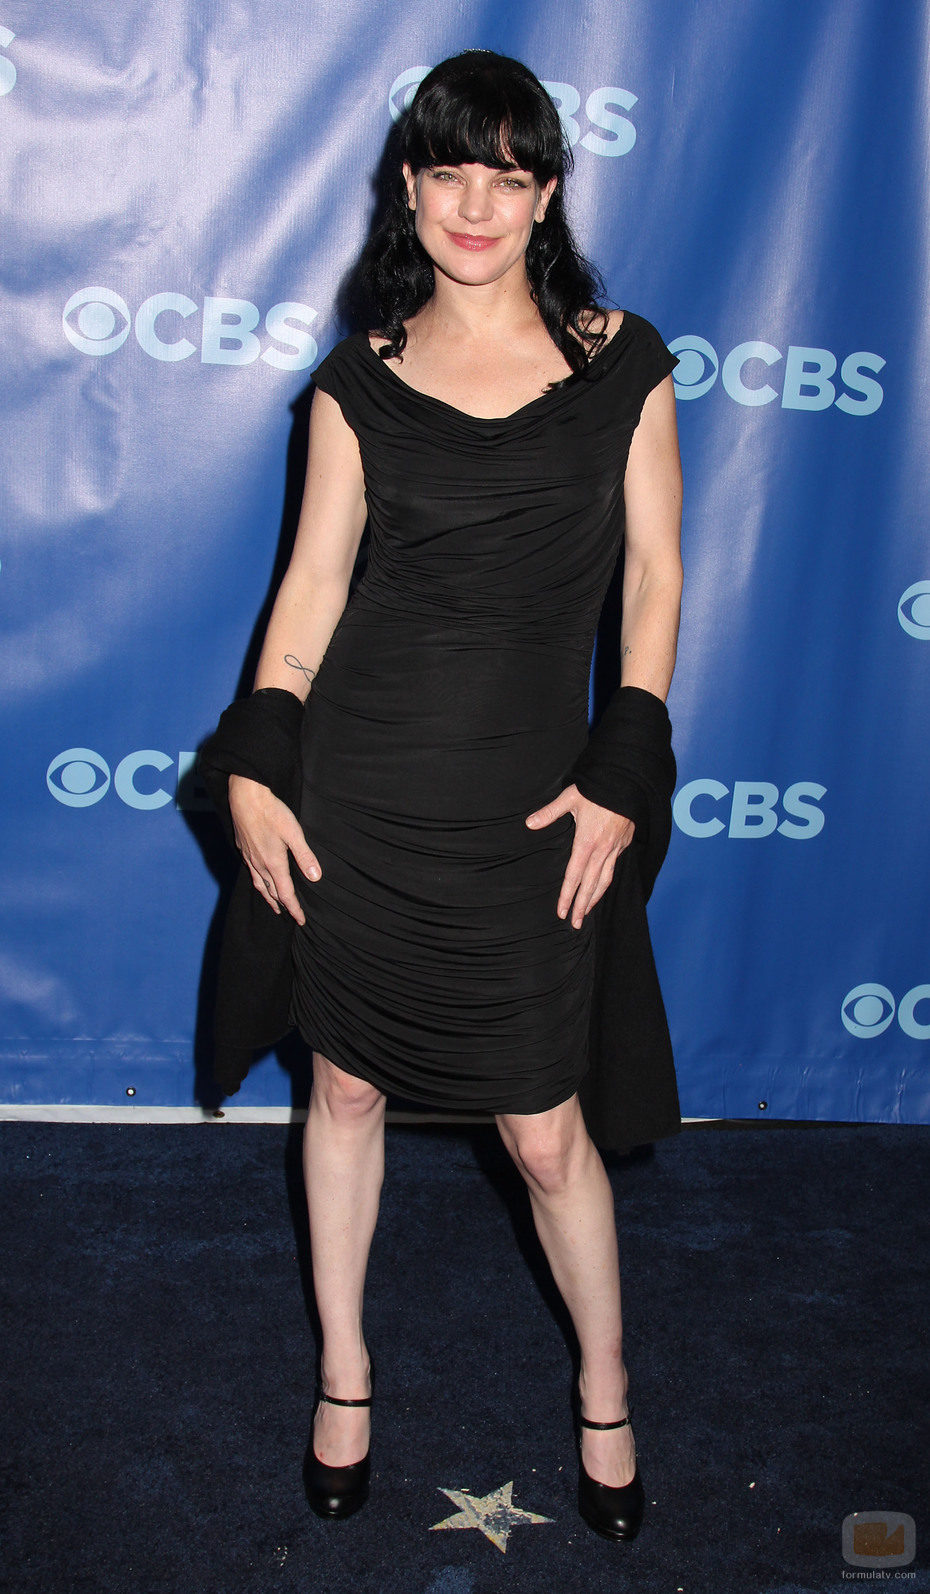 Pauley Perrette de 'NCIS' en los Upfronts 2011 de CBS